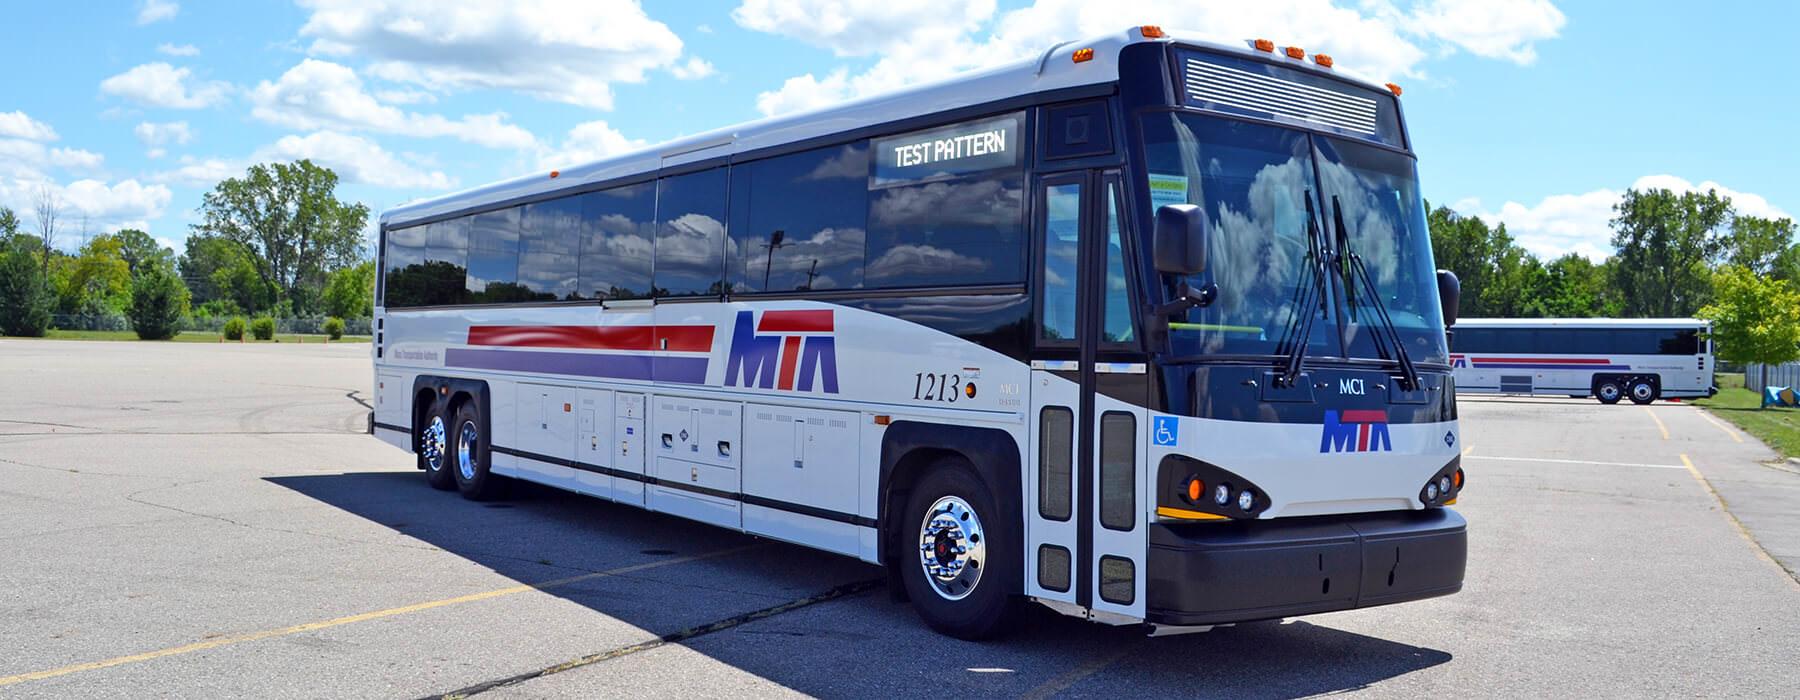 A Regional Route Bus